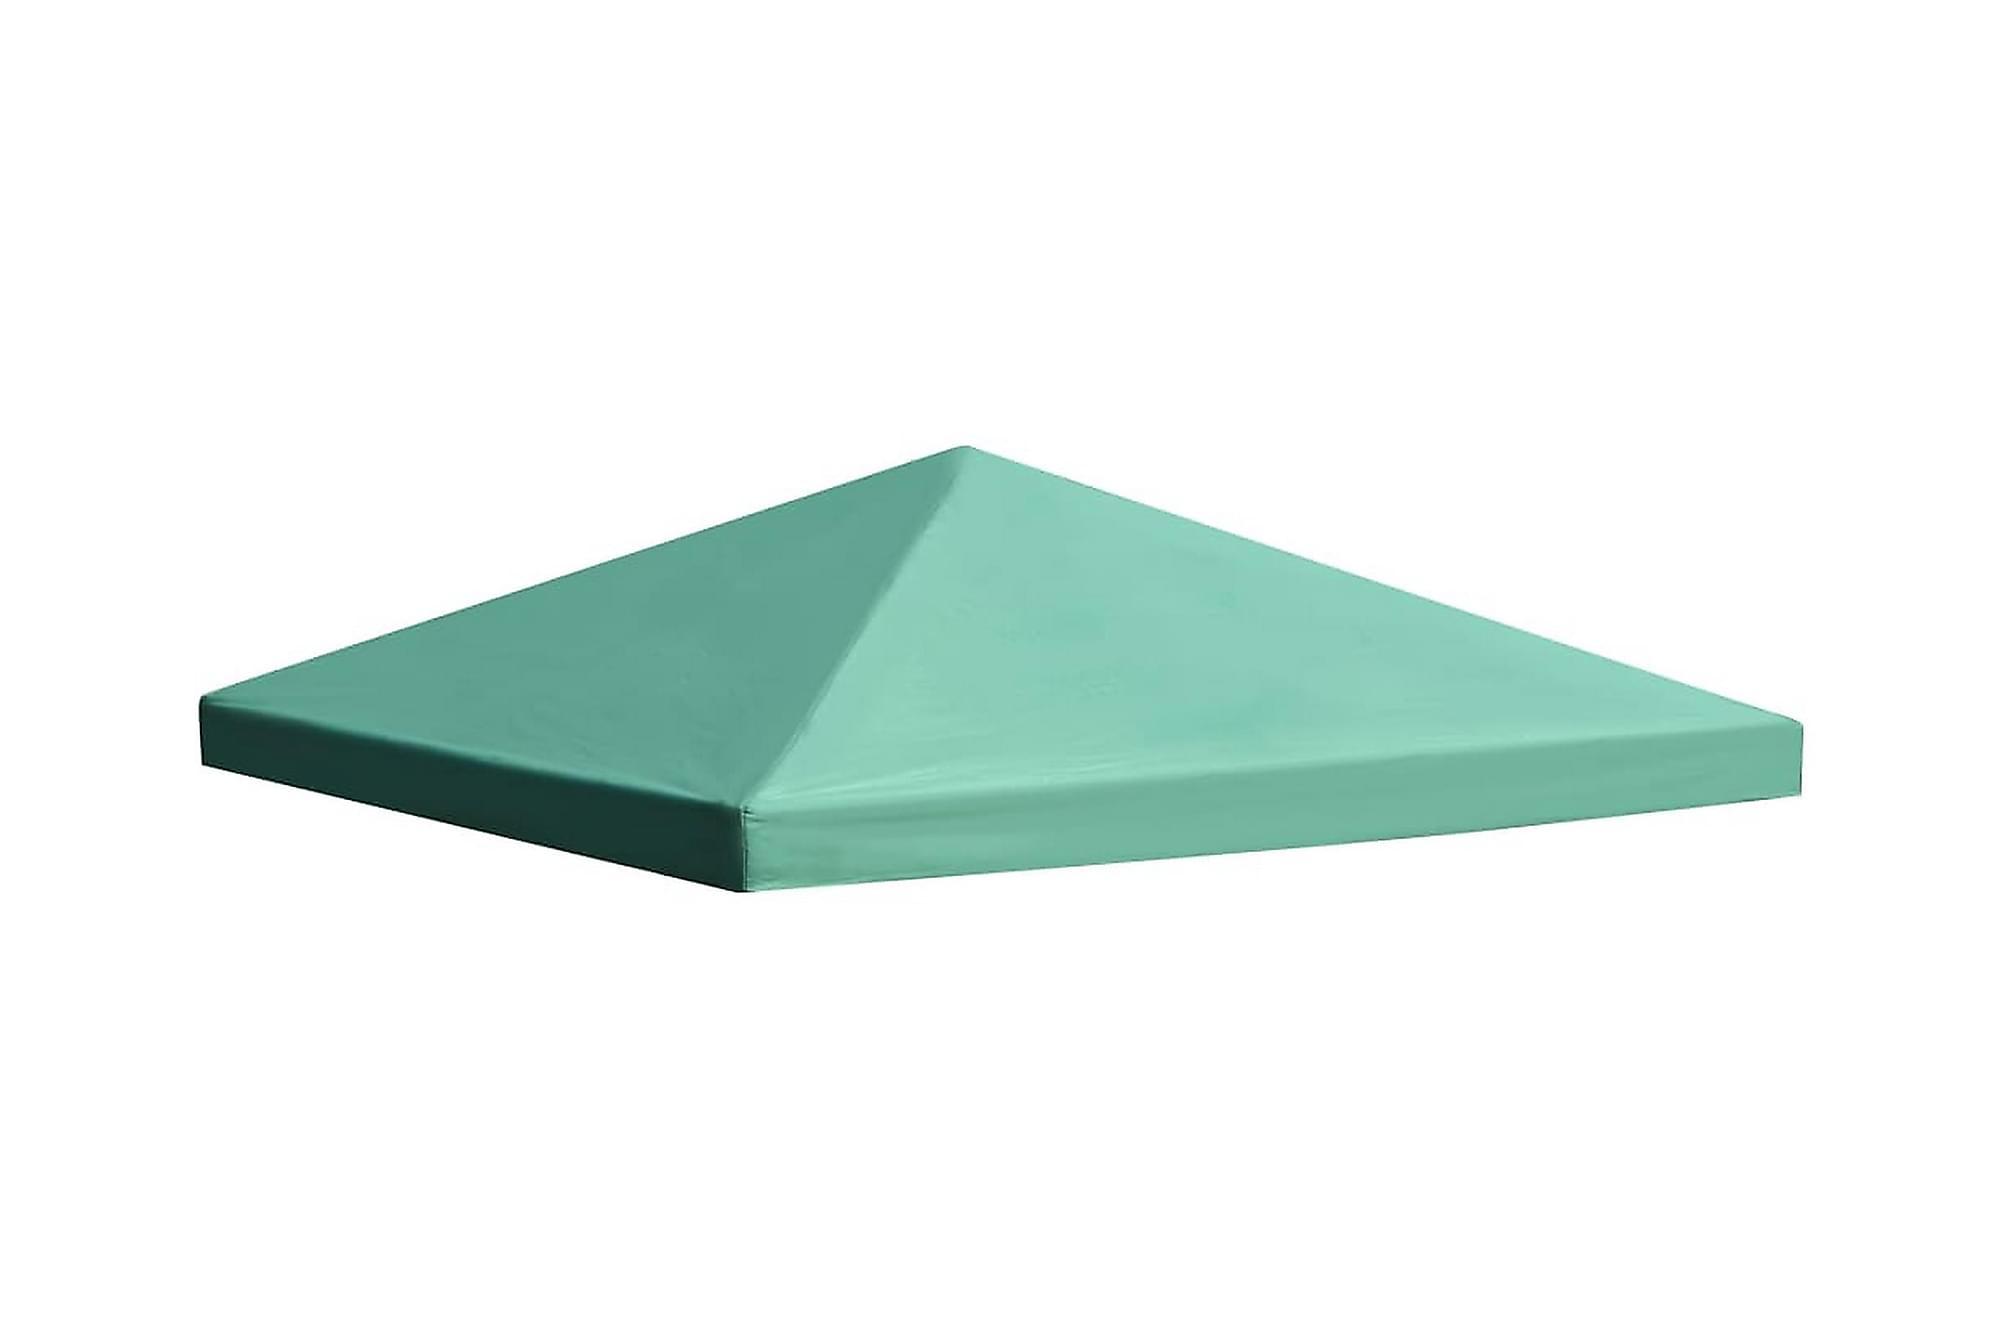 Paviljongtak 310 g/m2 3×3 m grön